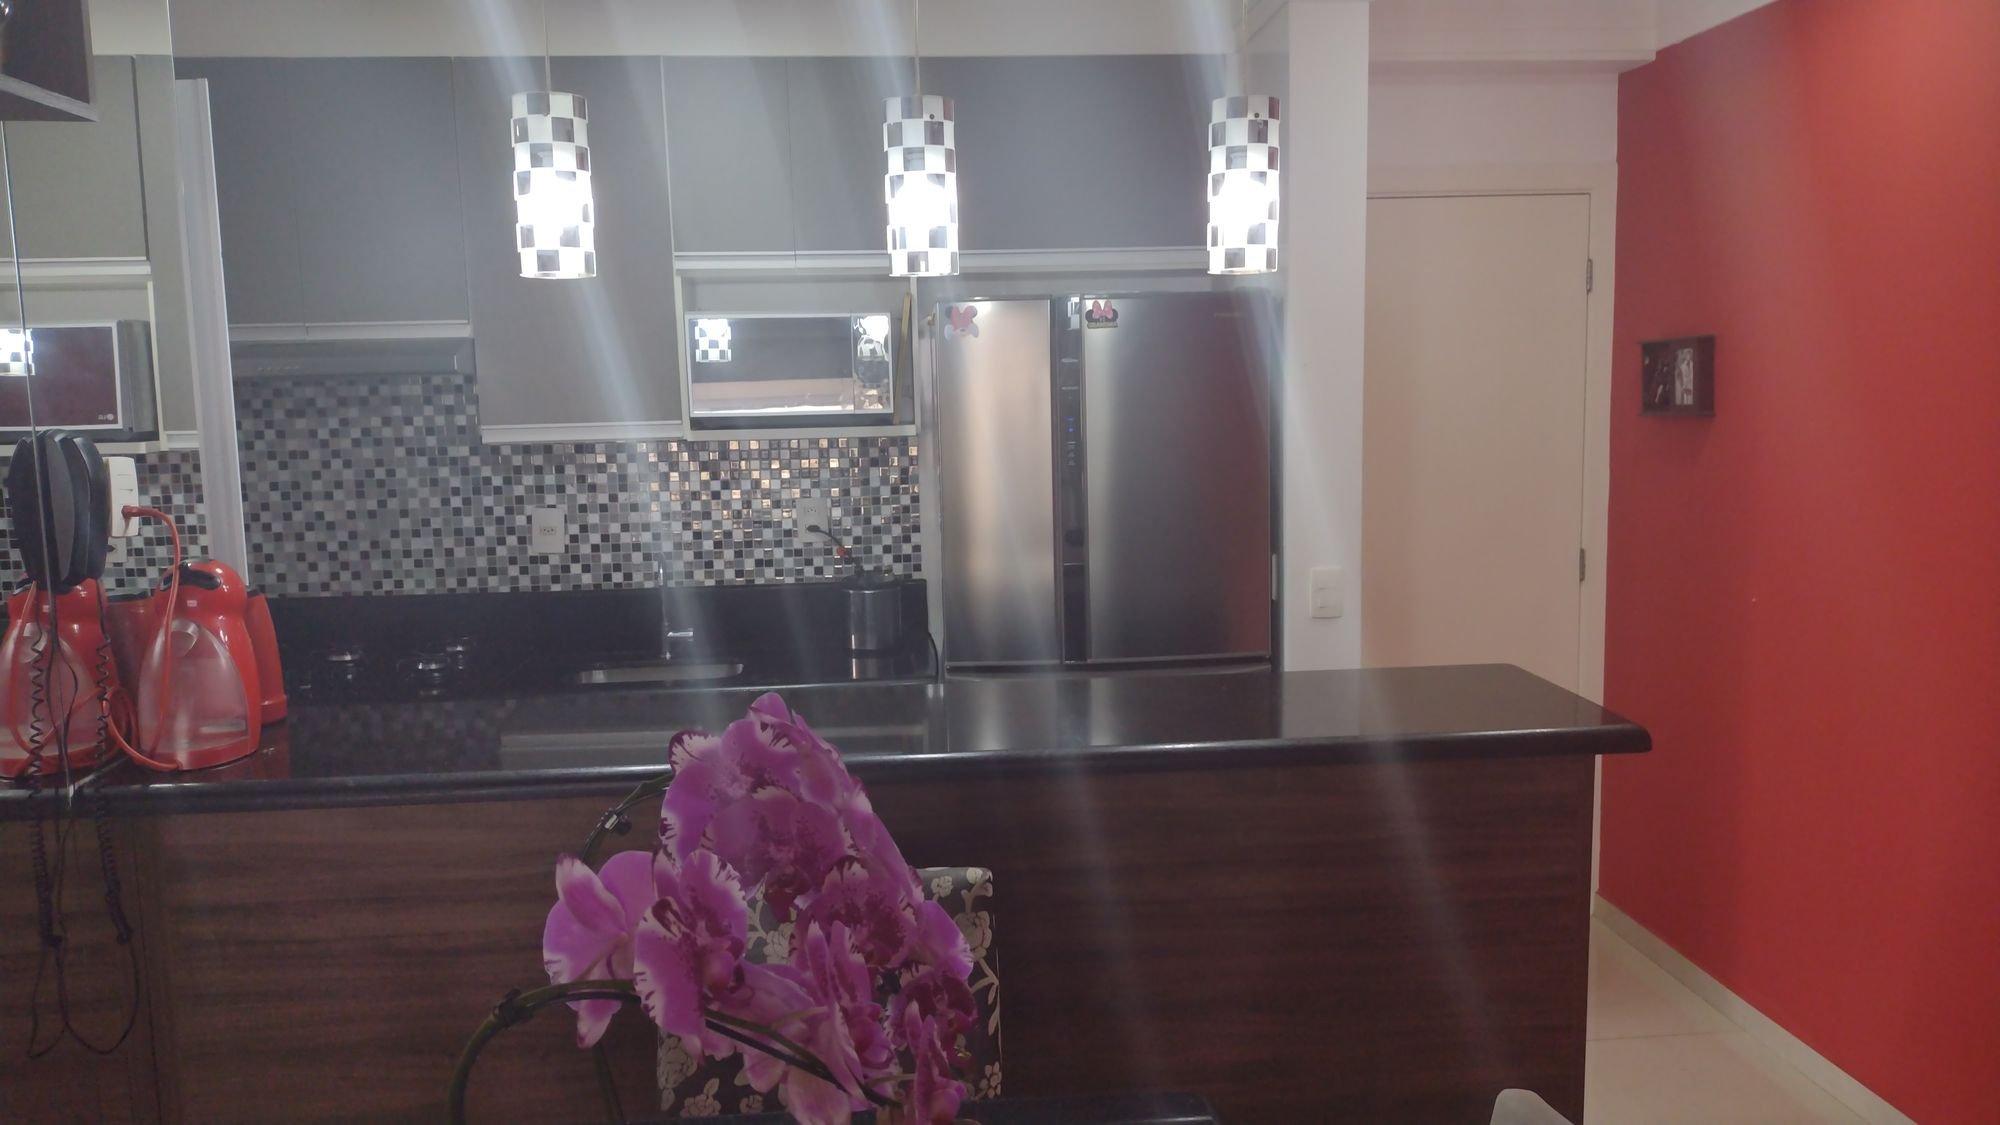 Foto de Sala com geladeira, garrafa